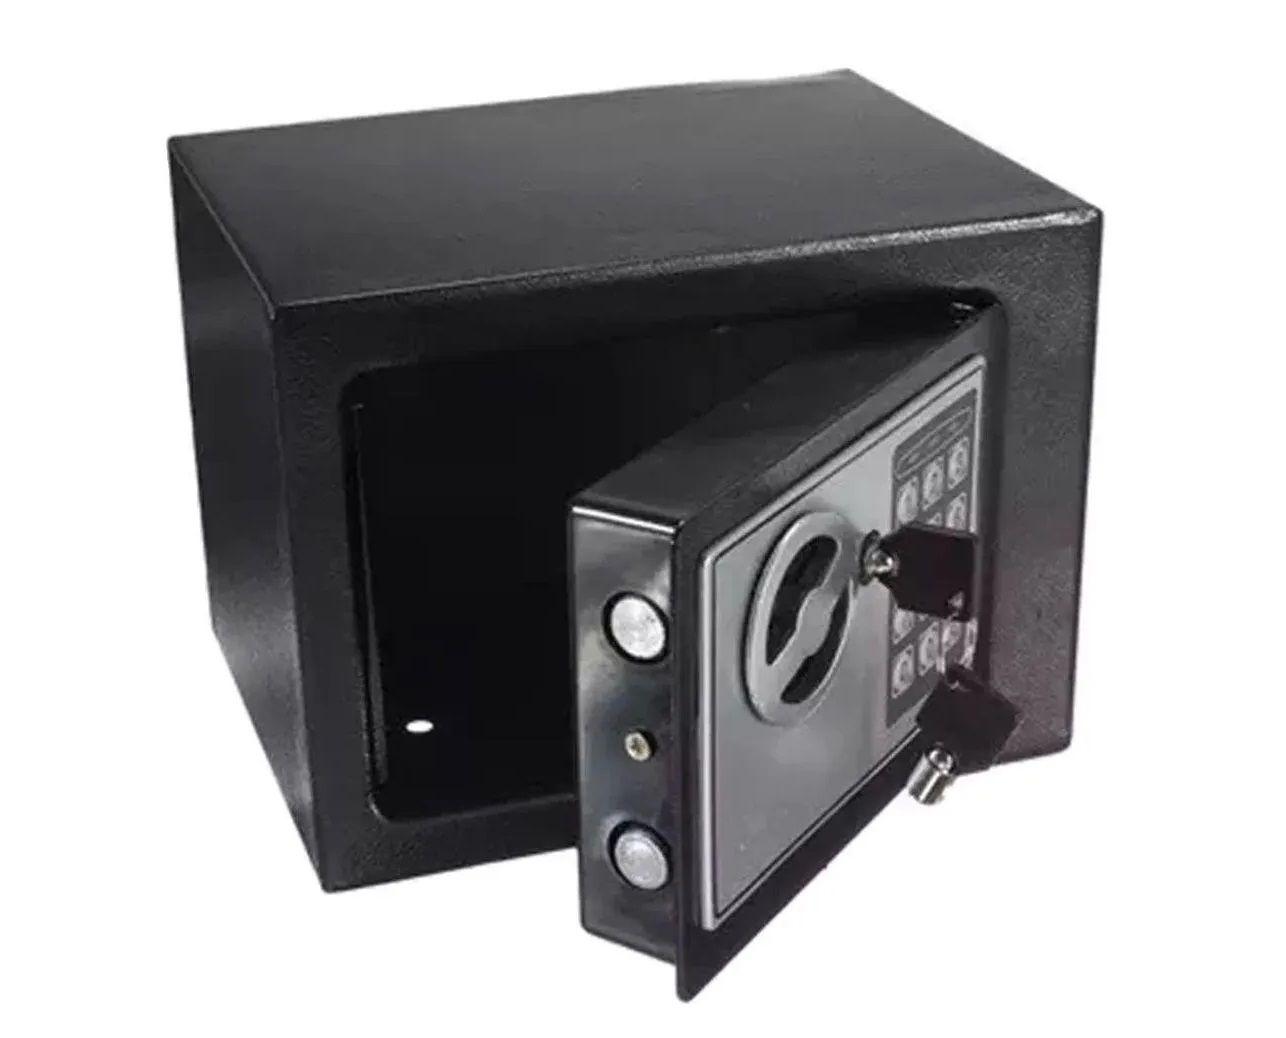 Cofre De Segurança 23x17 Eletrônico - Importway